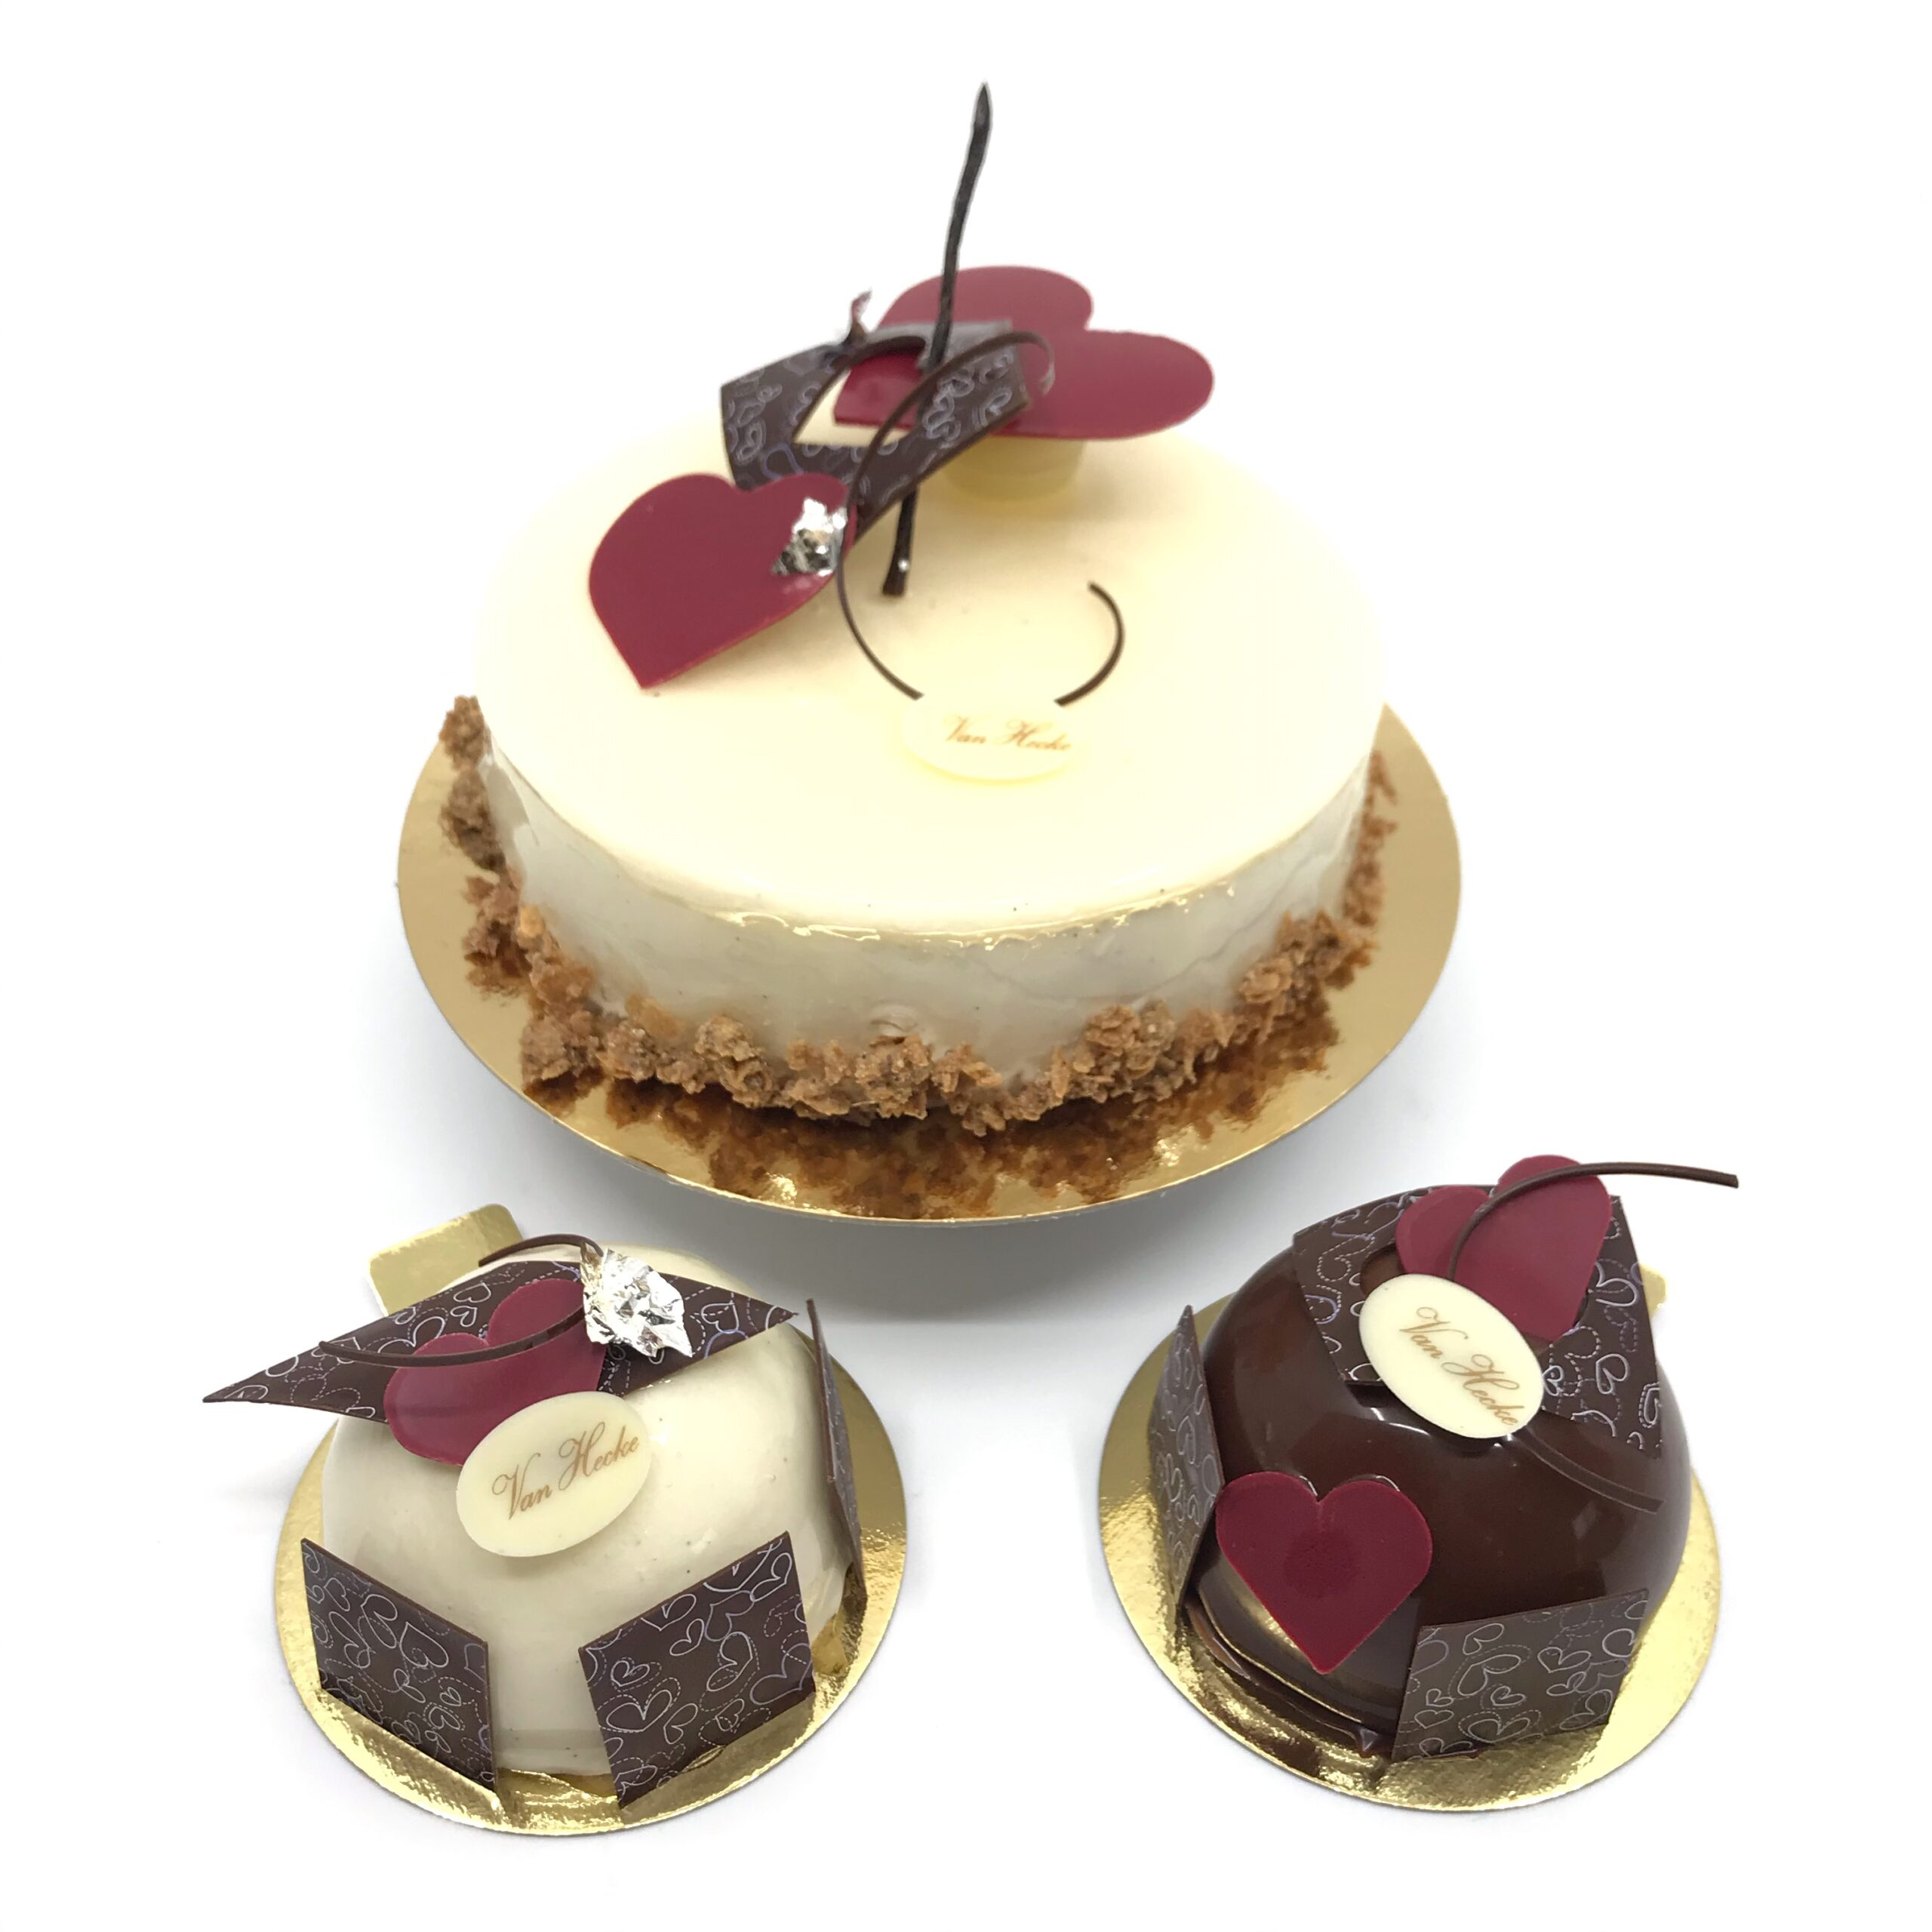 ChocolatesVanHecke_valentijn_tiramisu_gianduja2